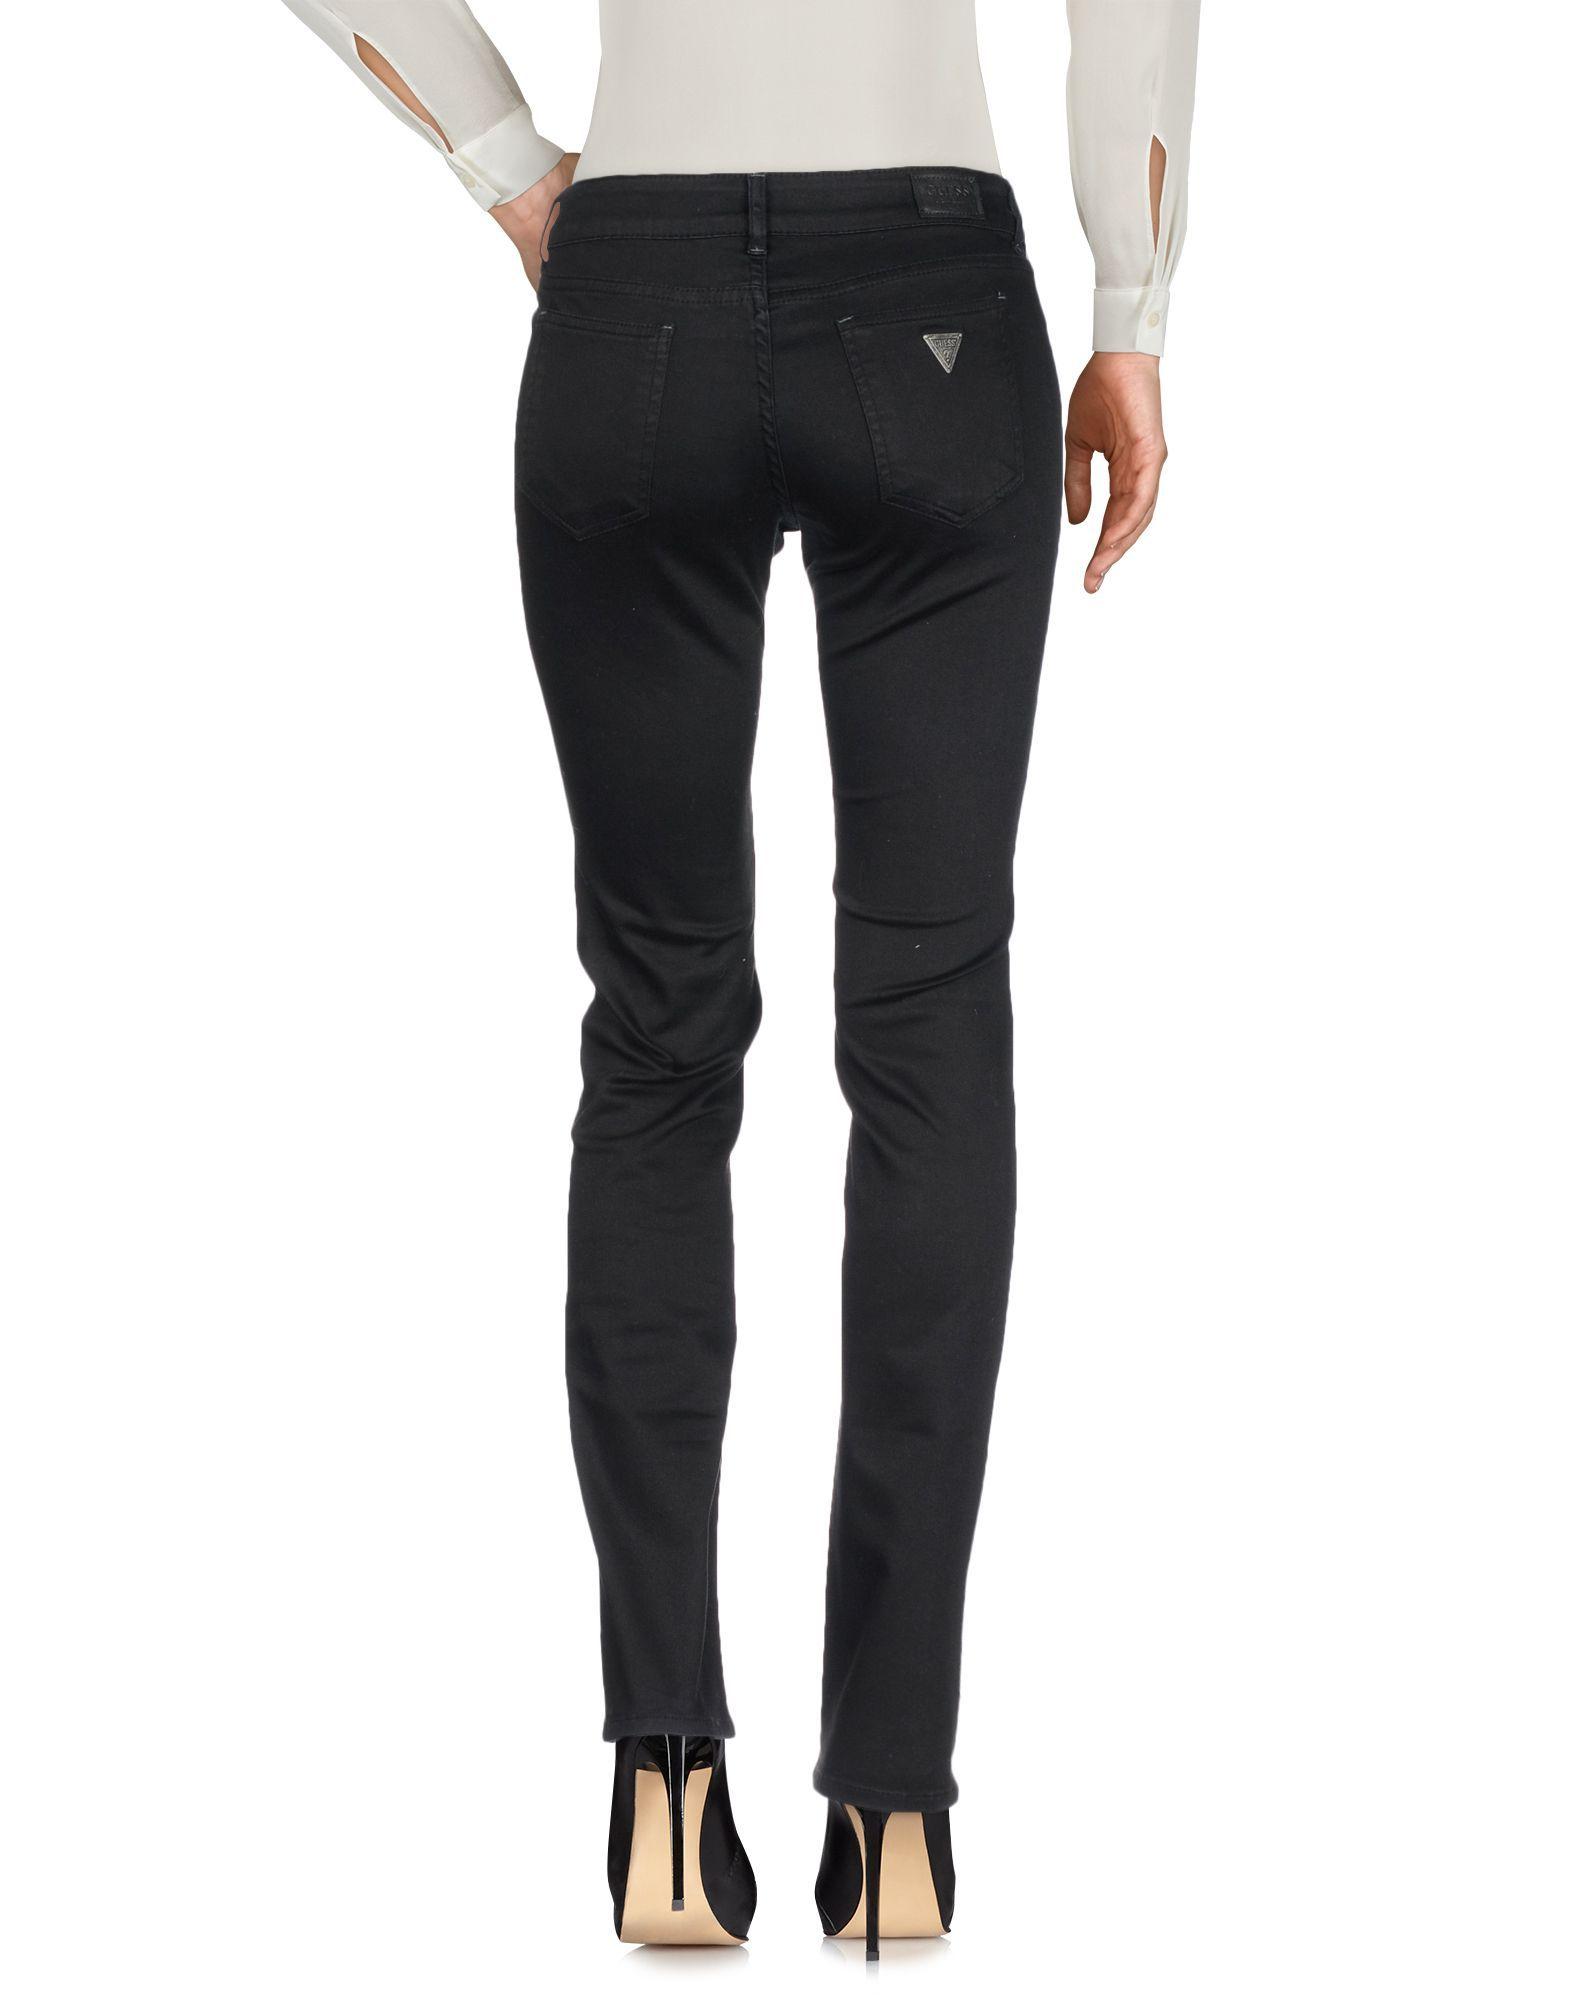 Guess Black Cotton Trousers